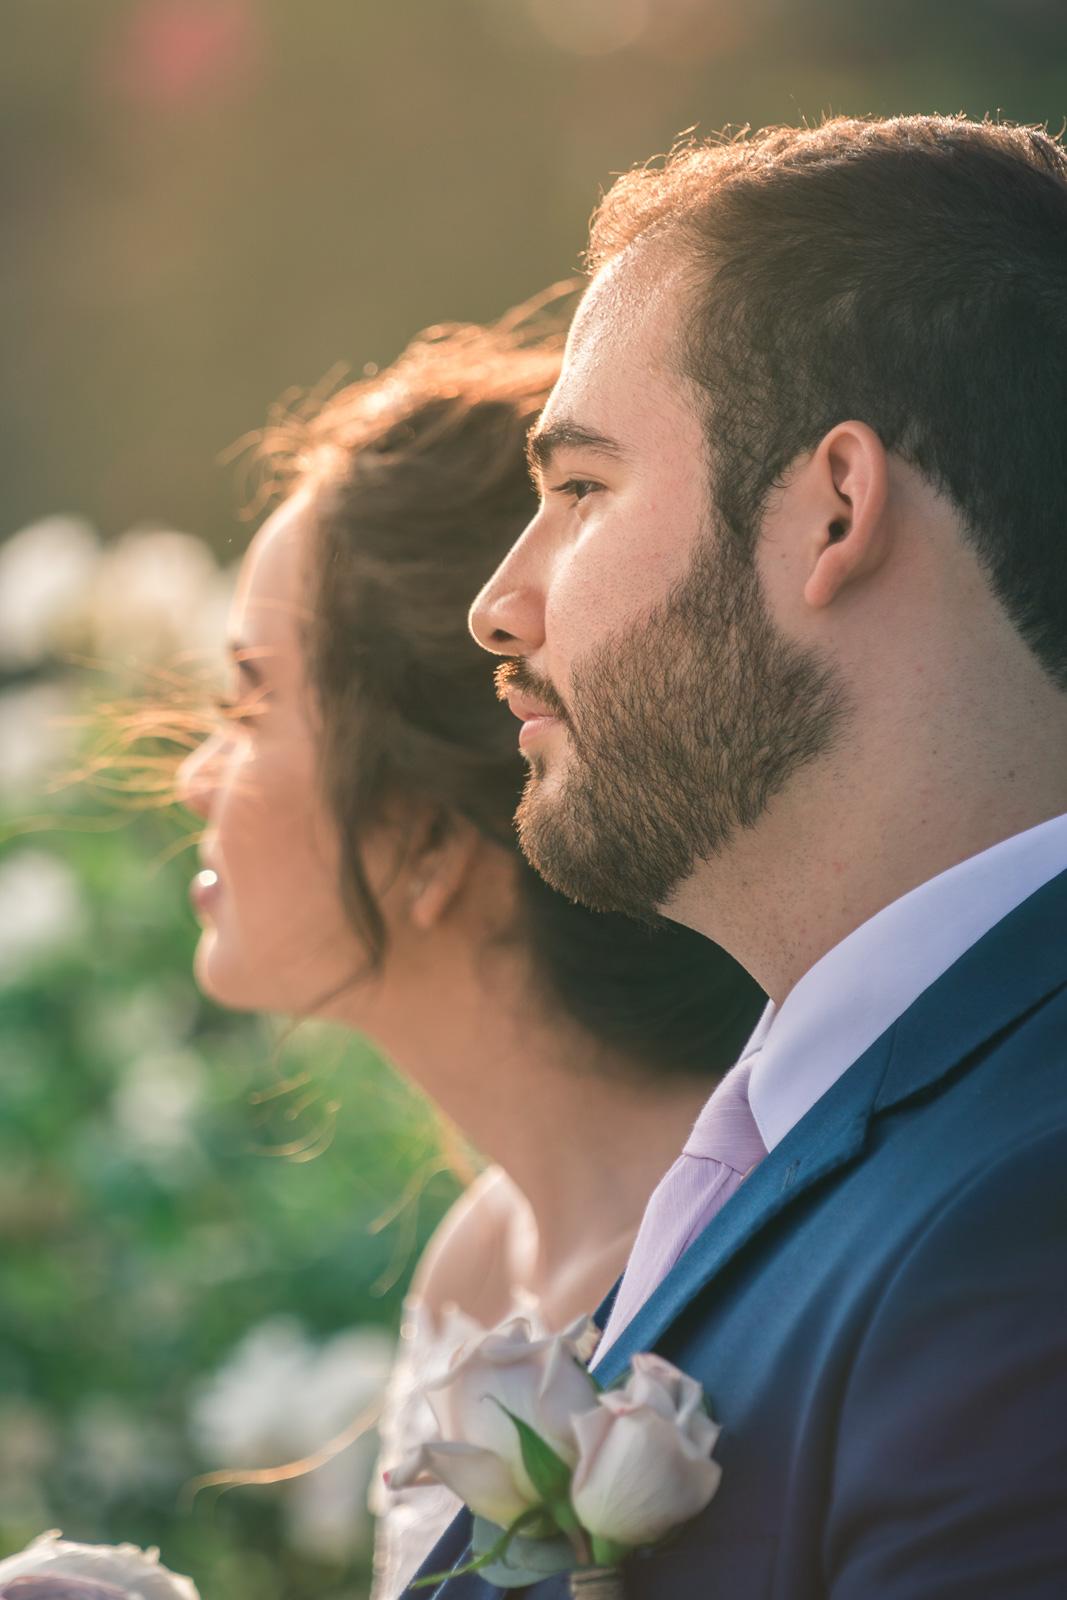 225_Angel-Brea-Orange-County_Joseph-Barber-Wedding-Photography.jpg